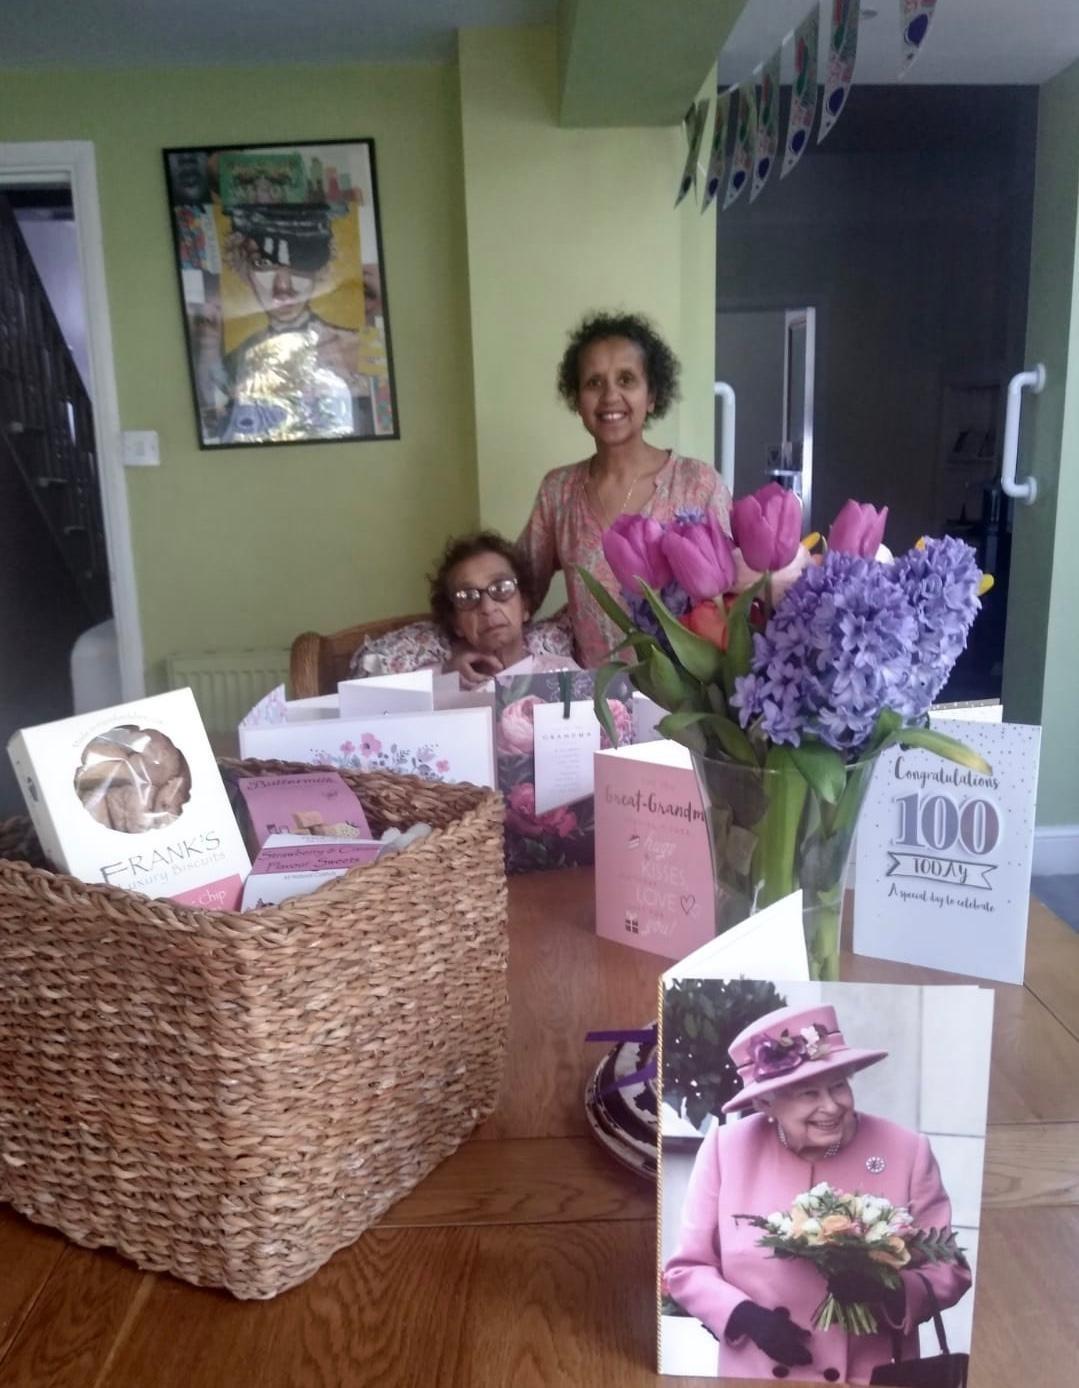 Newport great great grandmother celebrates 100th birthday